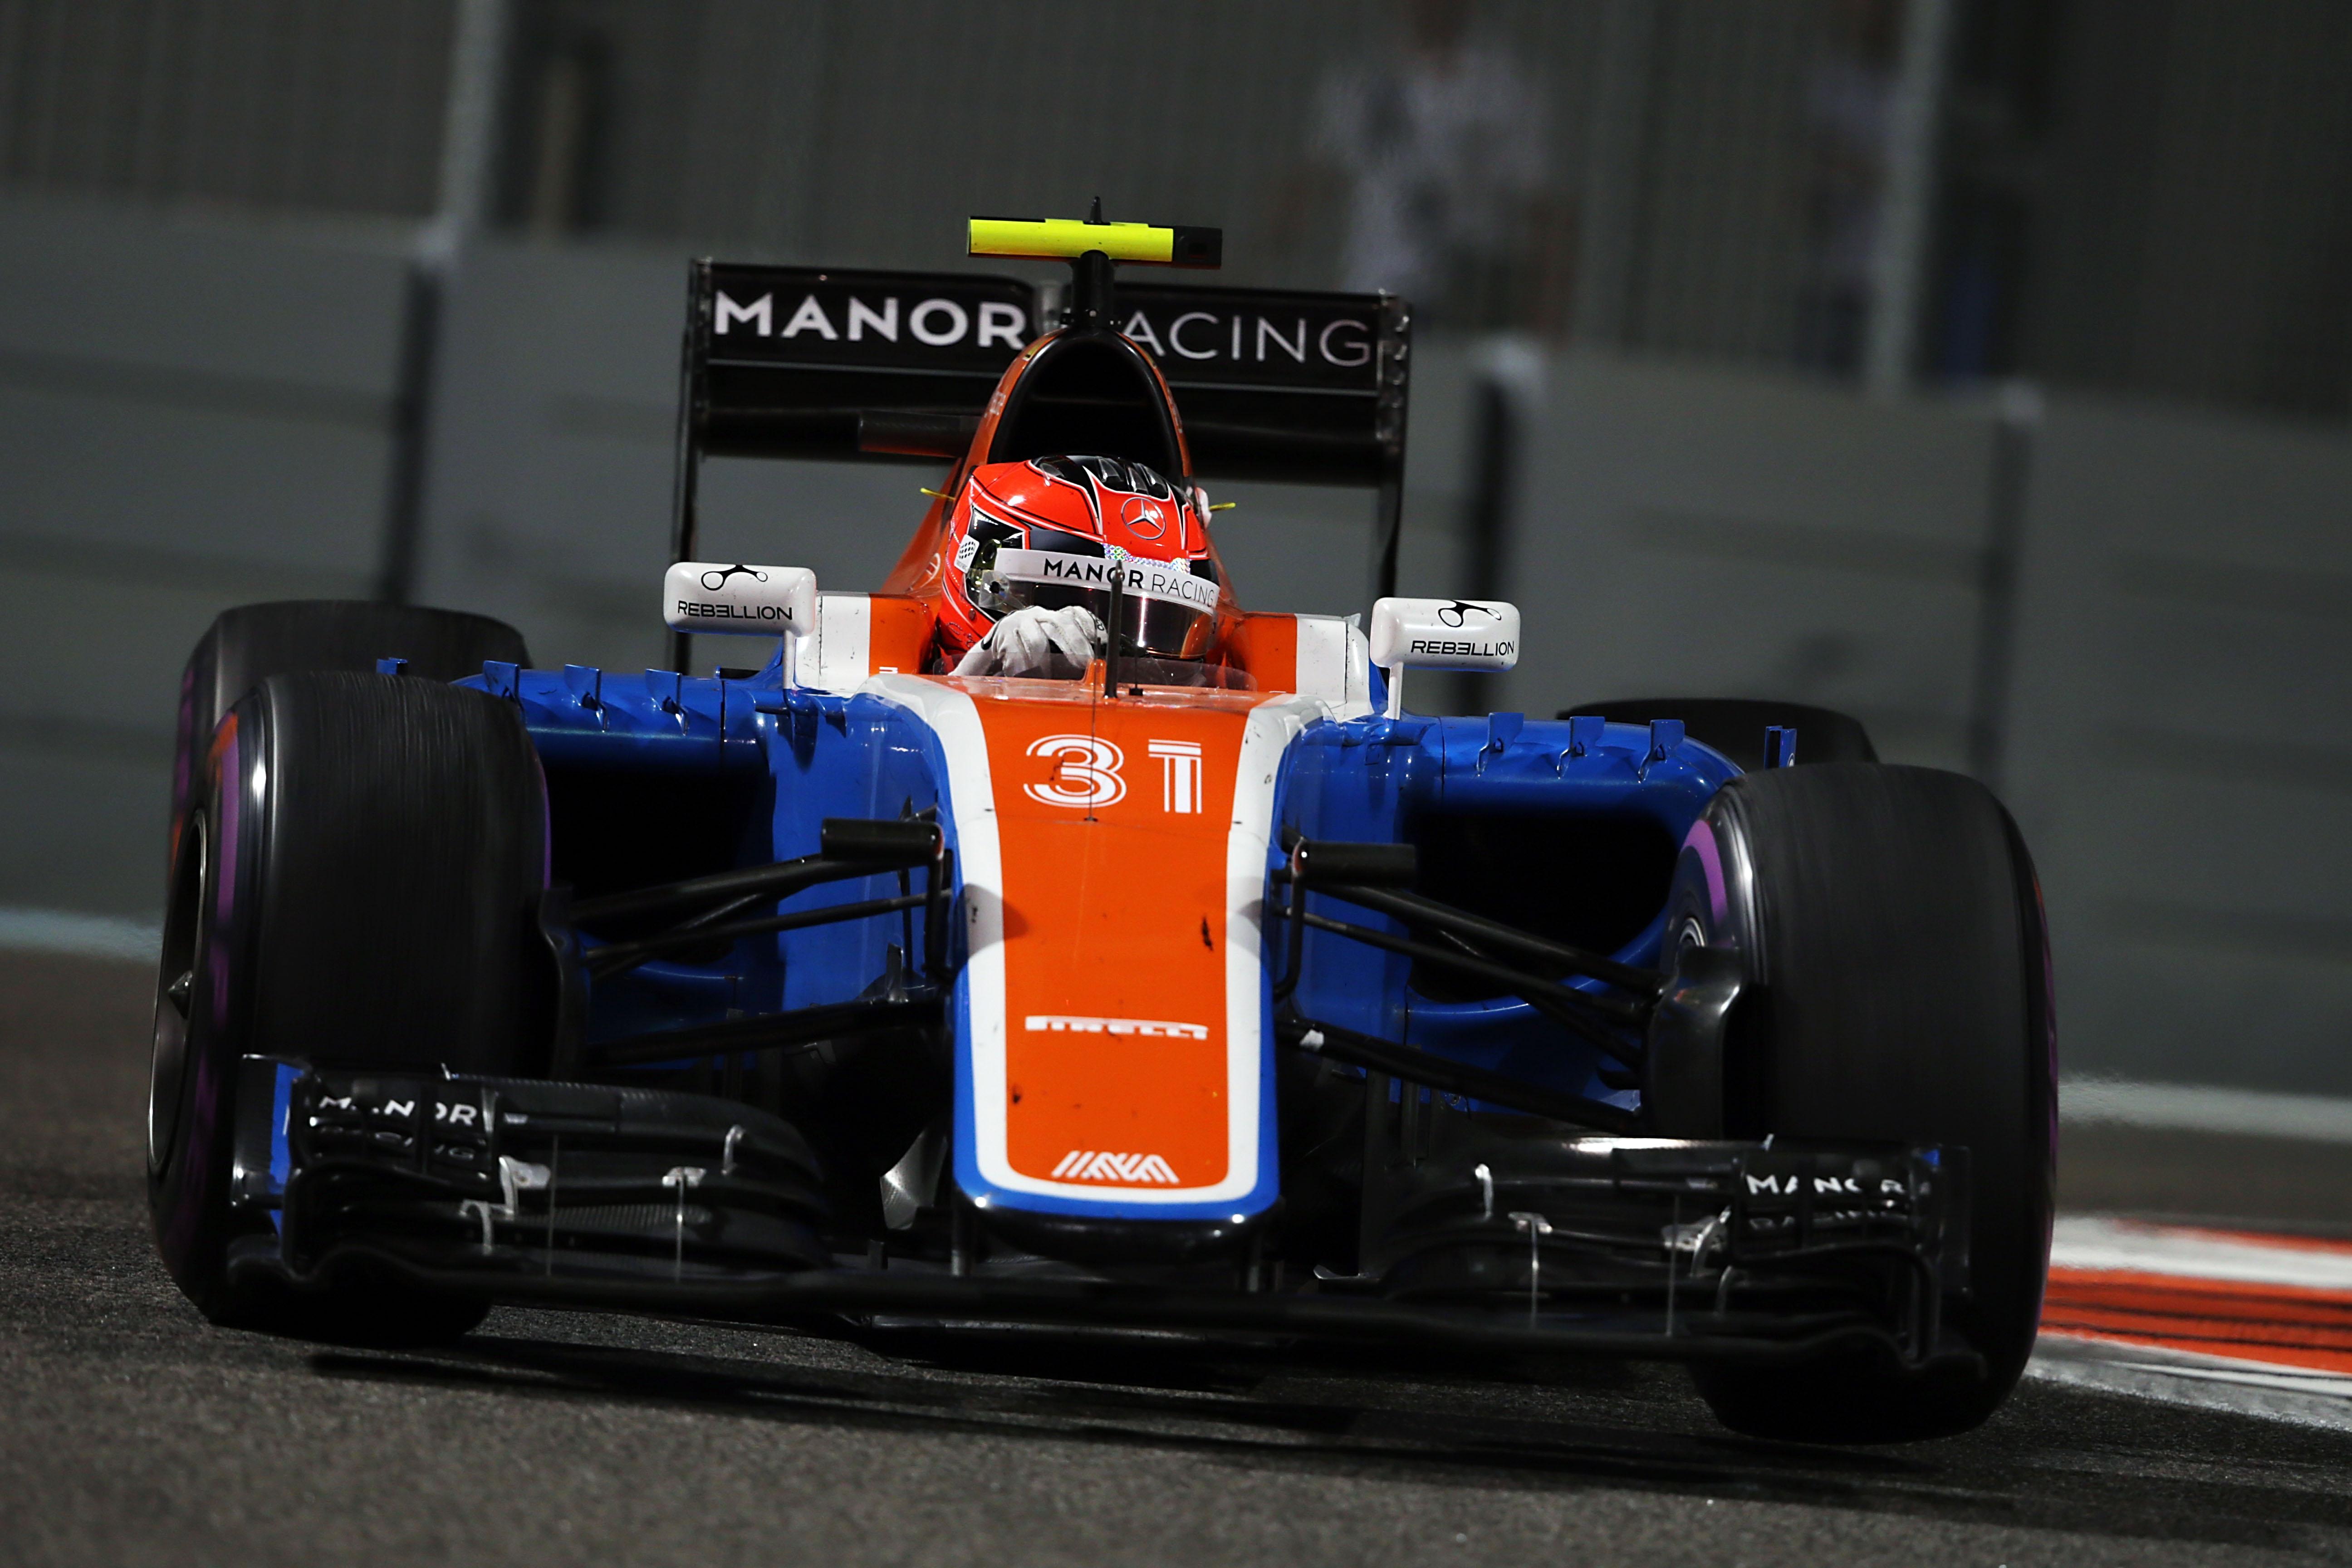 Esteban Ocon - Manor Racing F1